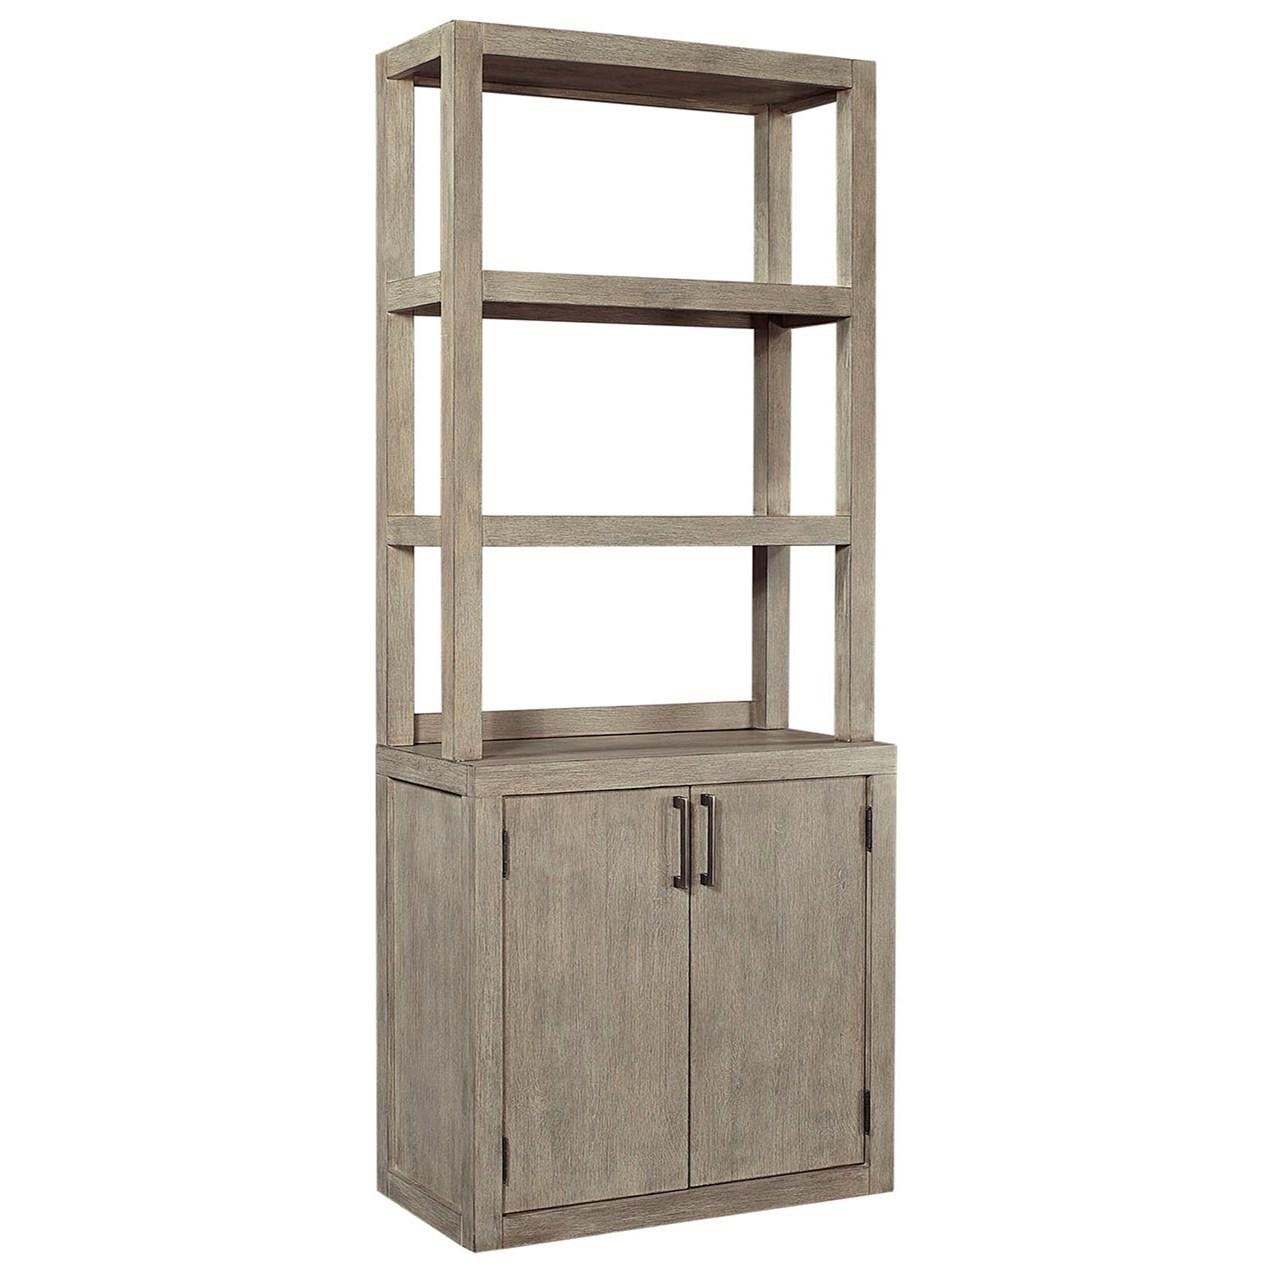 Platinum Bookcase by Aspenhome at Stoney Creek Furniture